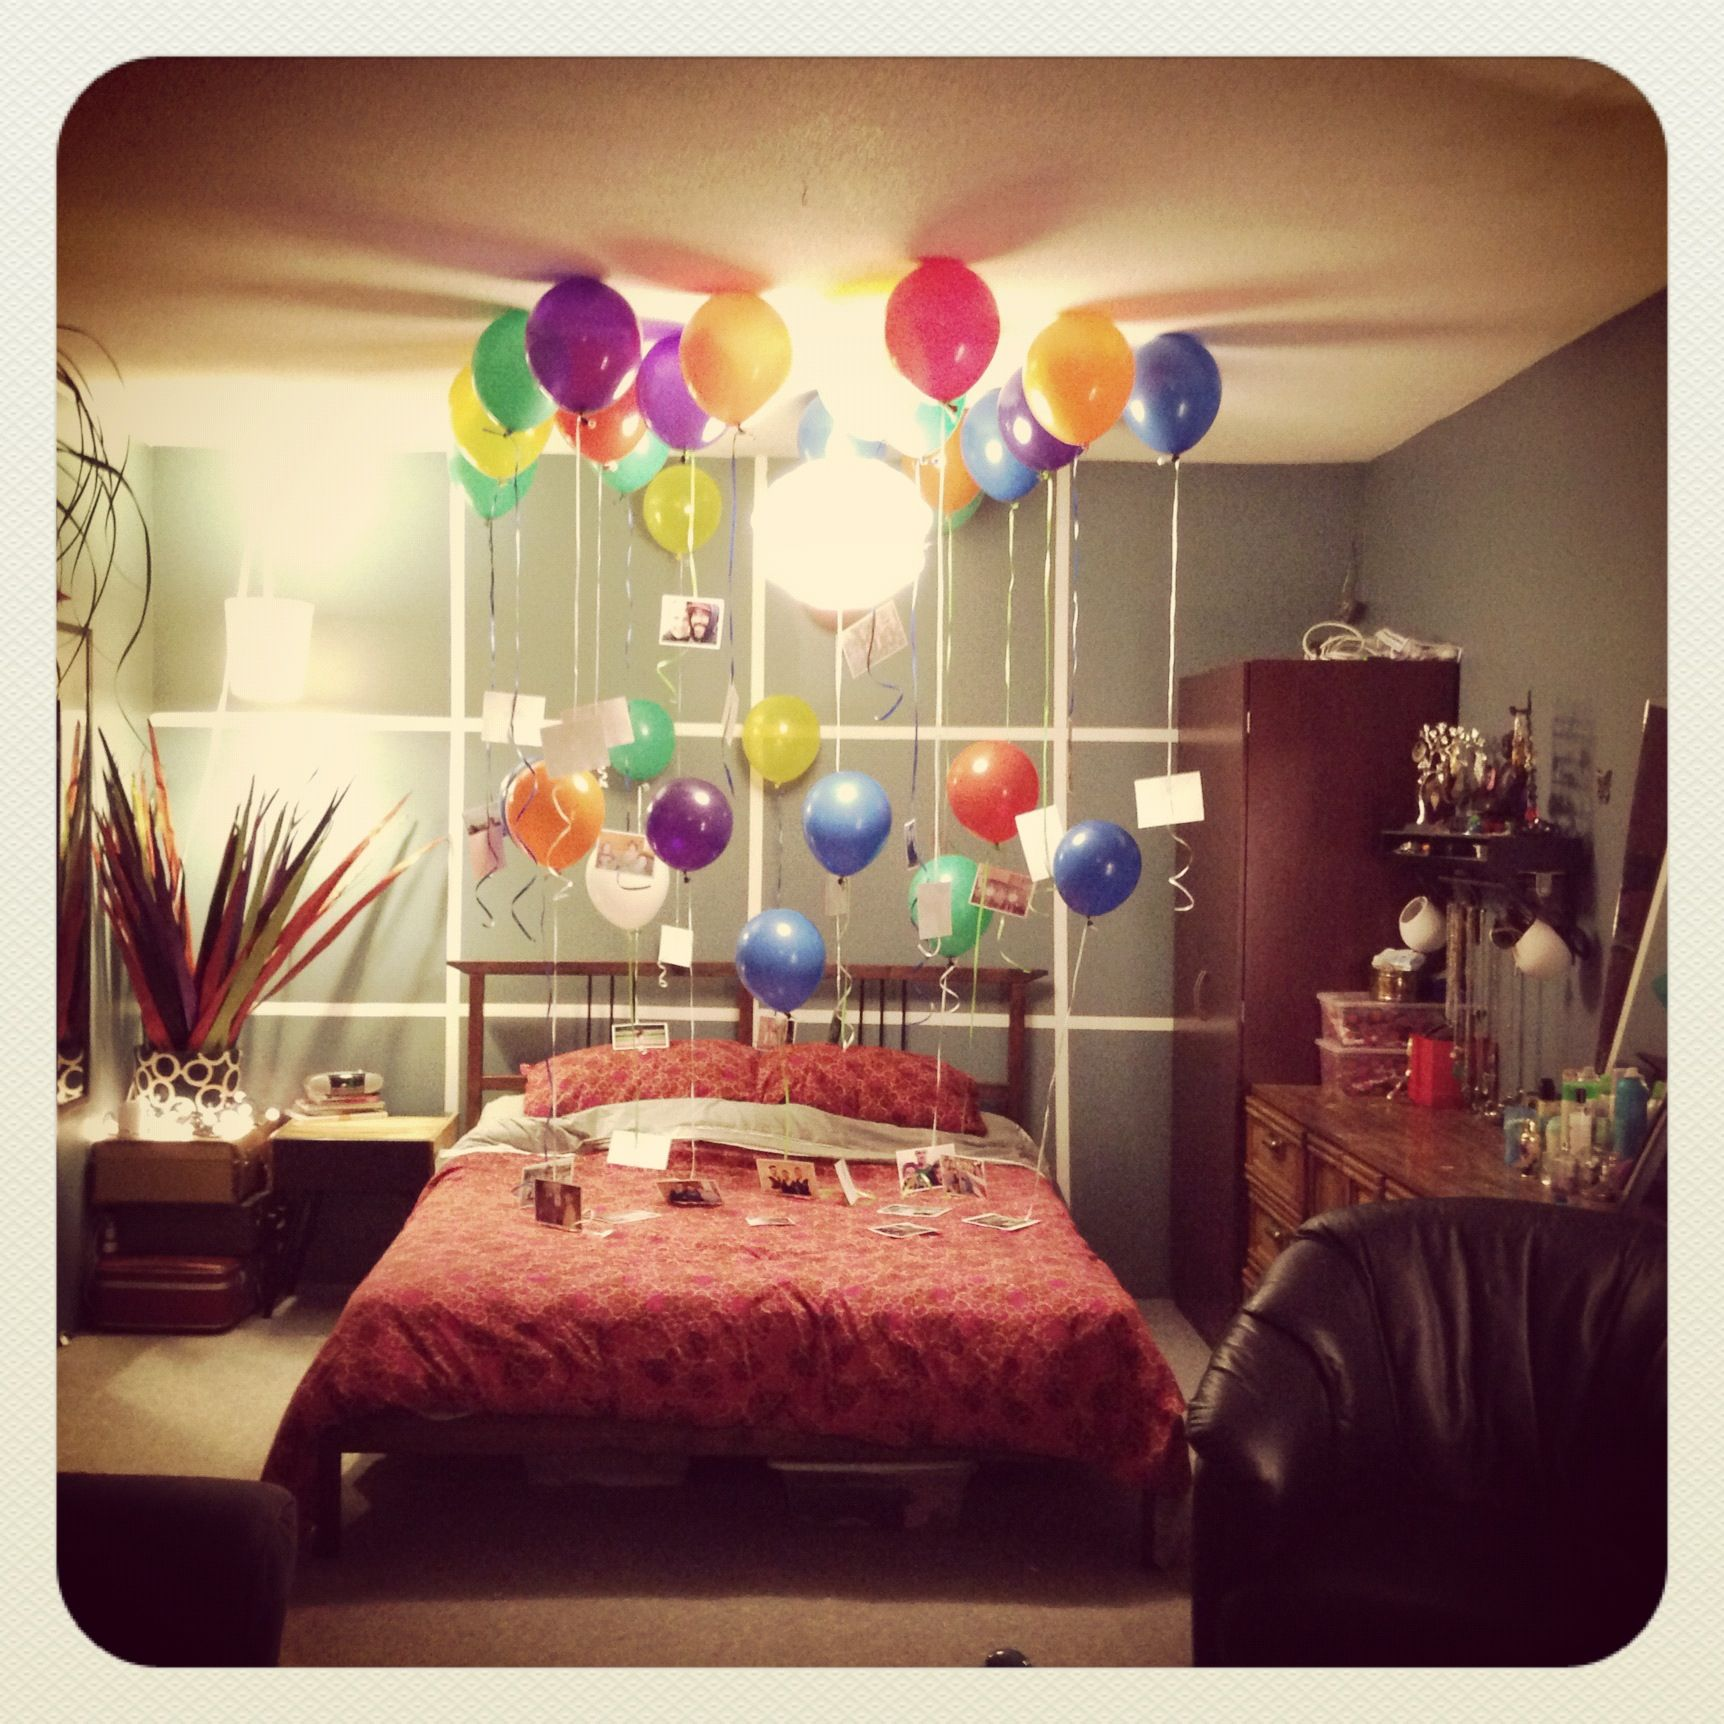 Birthday Surprise for the Boyfriend ) Birthday room